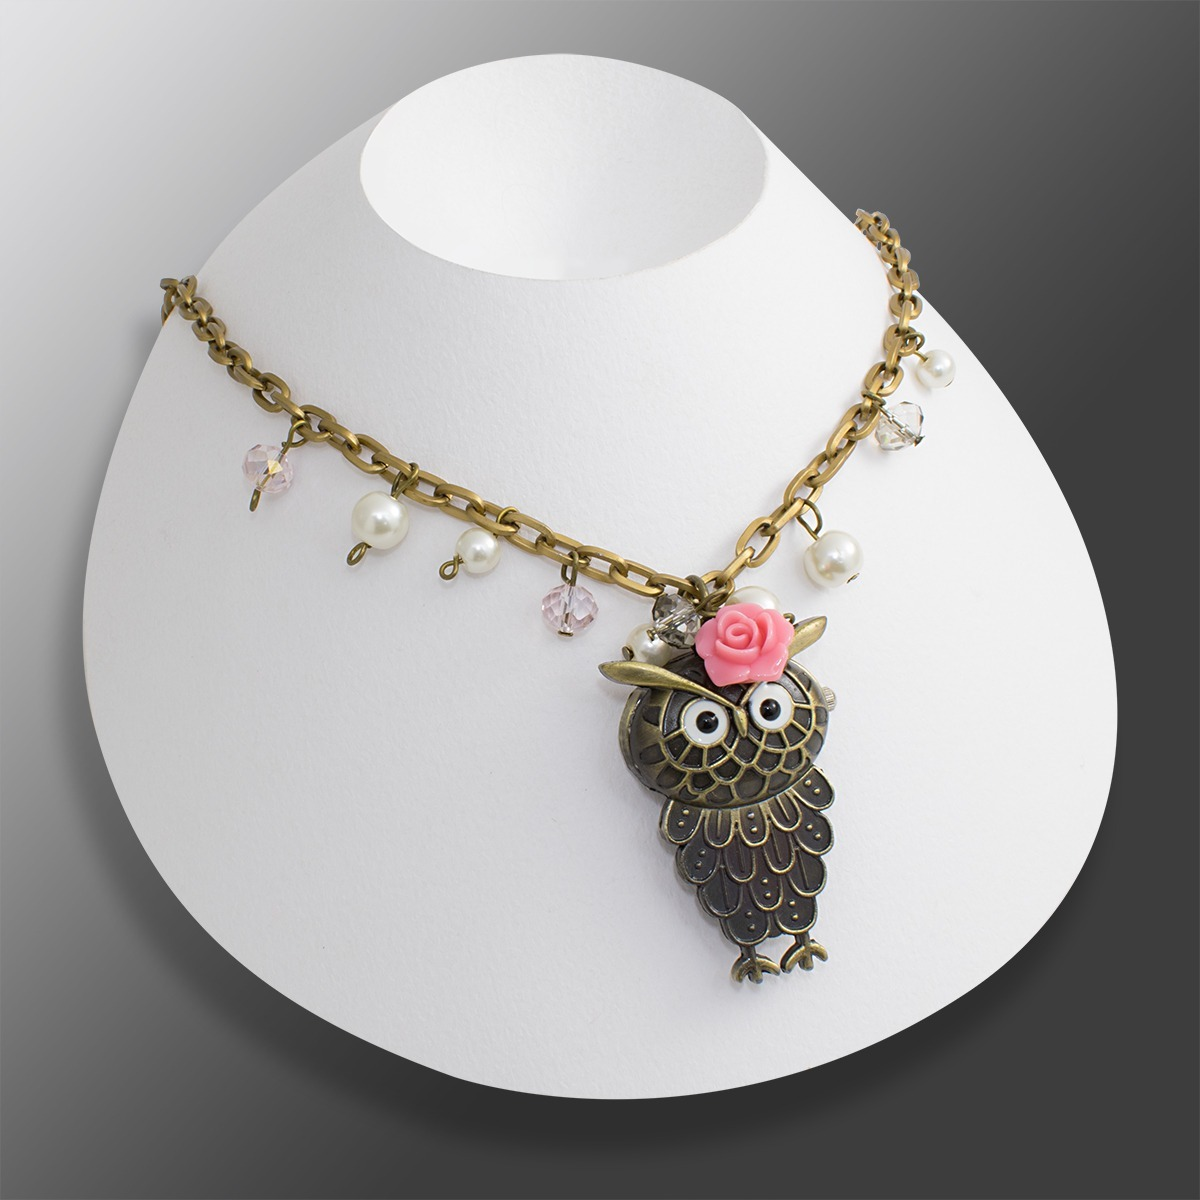 831ca23e0603 Collares Mujer Reloj De Bolsillo Vintage Buho Joyas De Moda